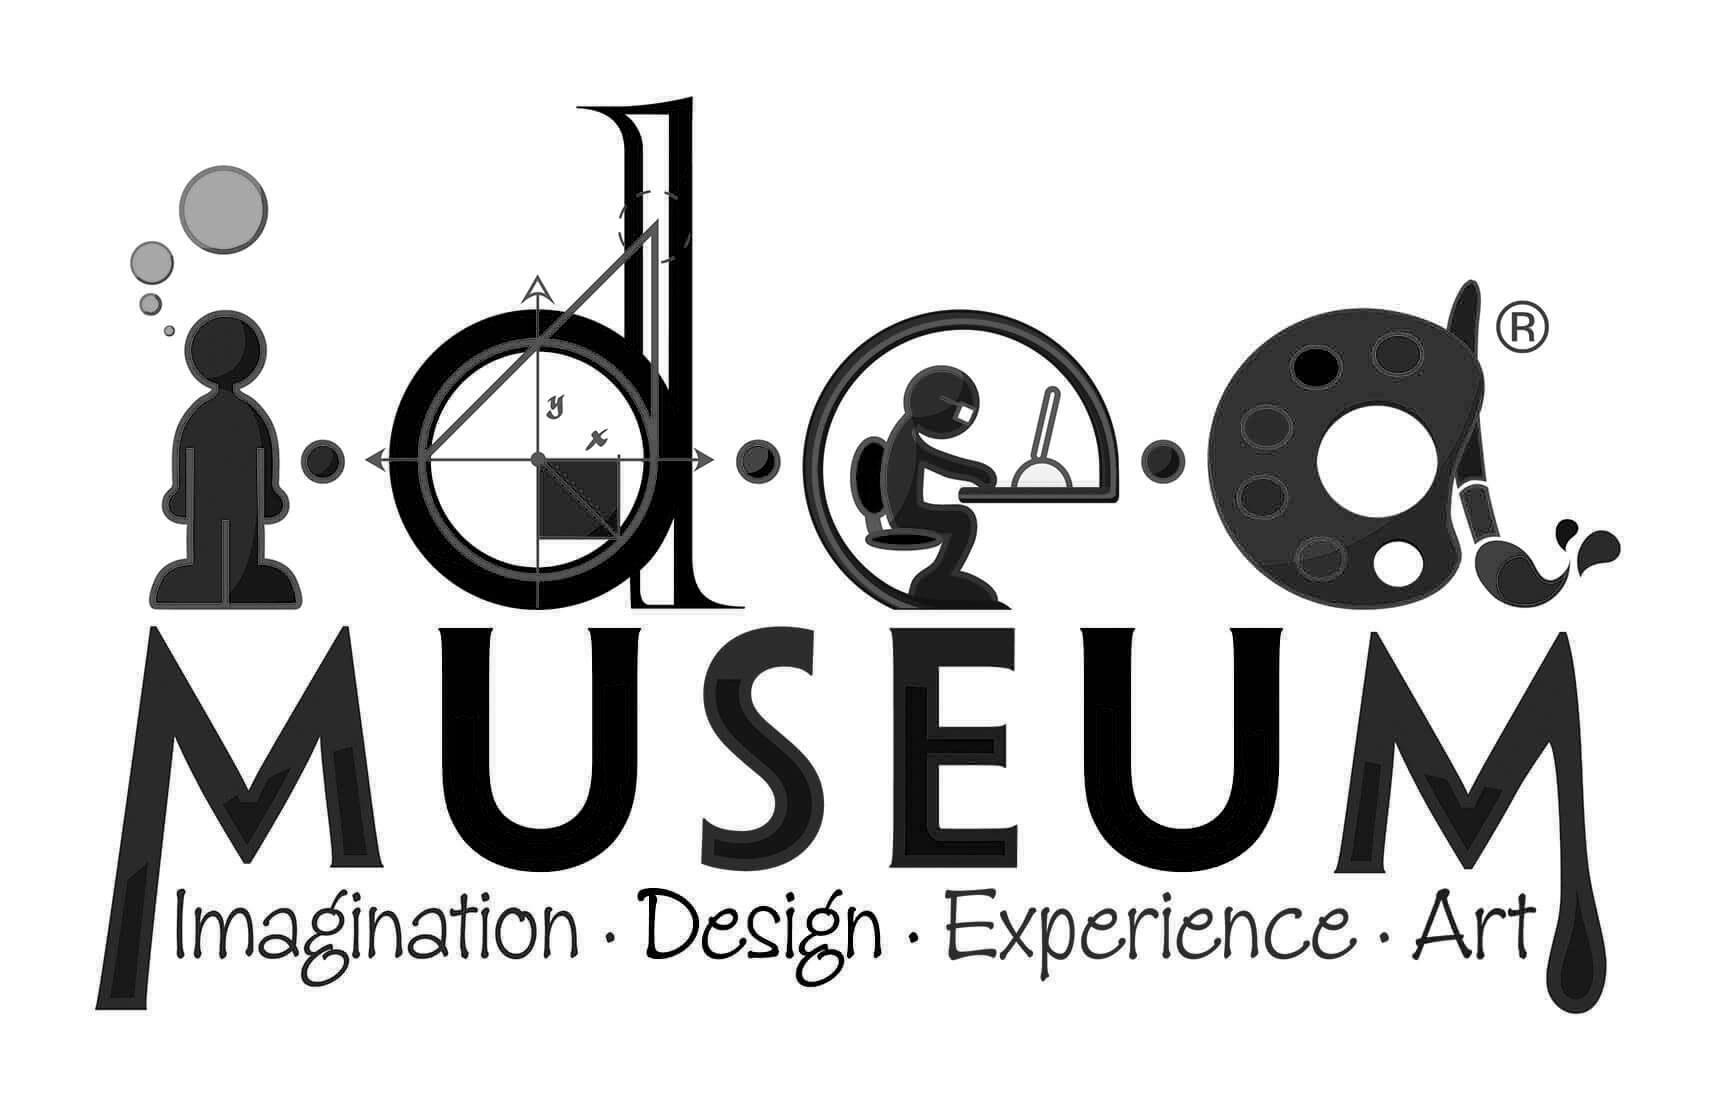 idea-museum-full-logo_black.jpg